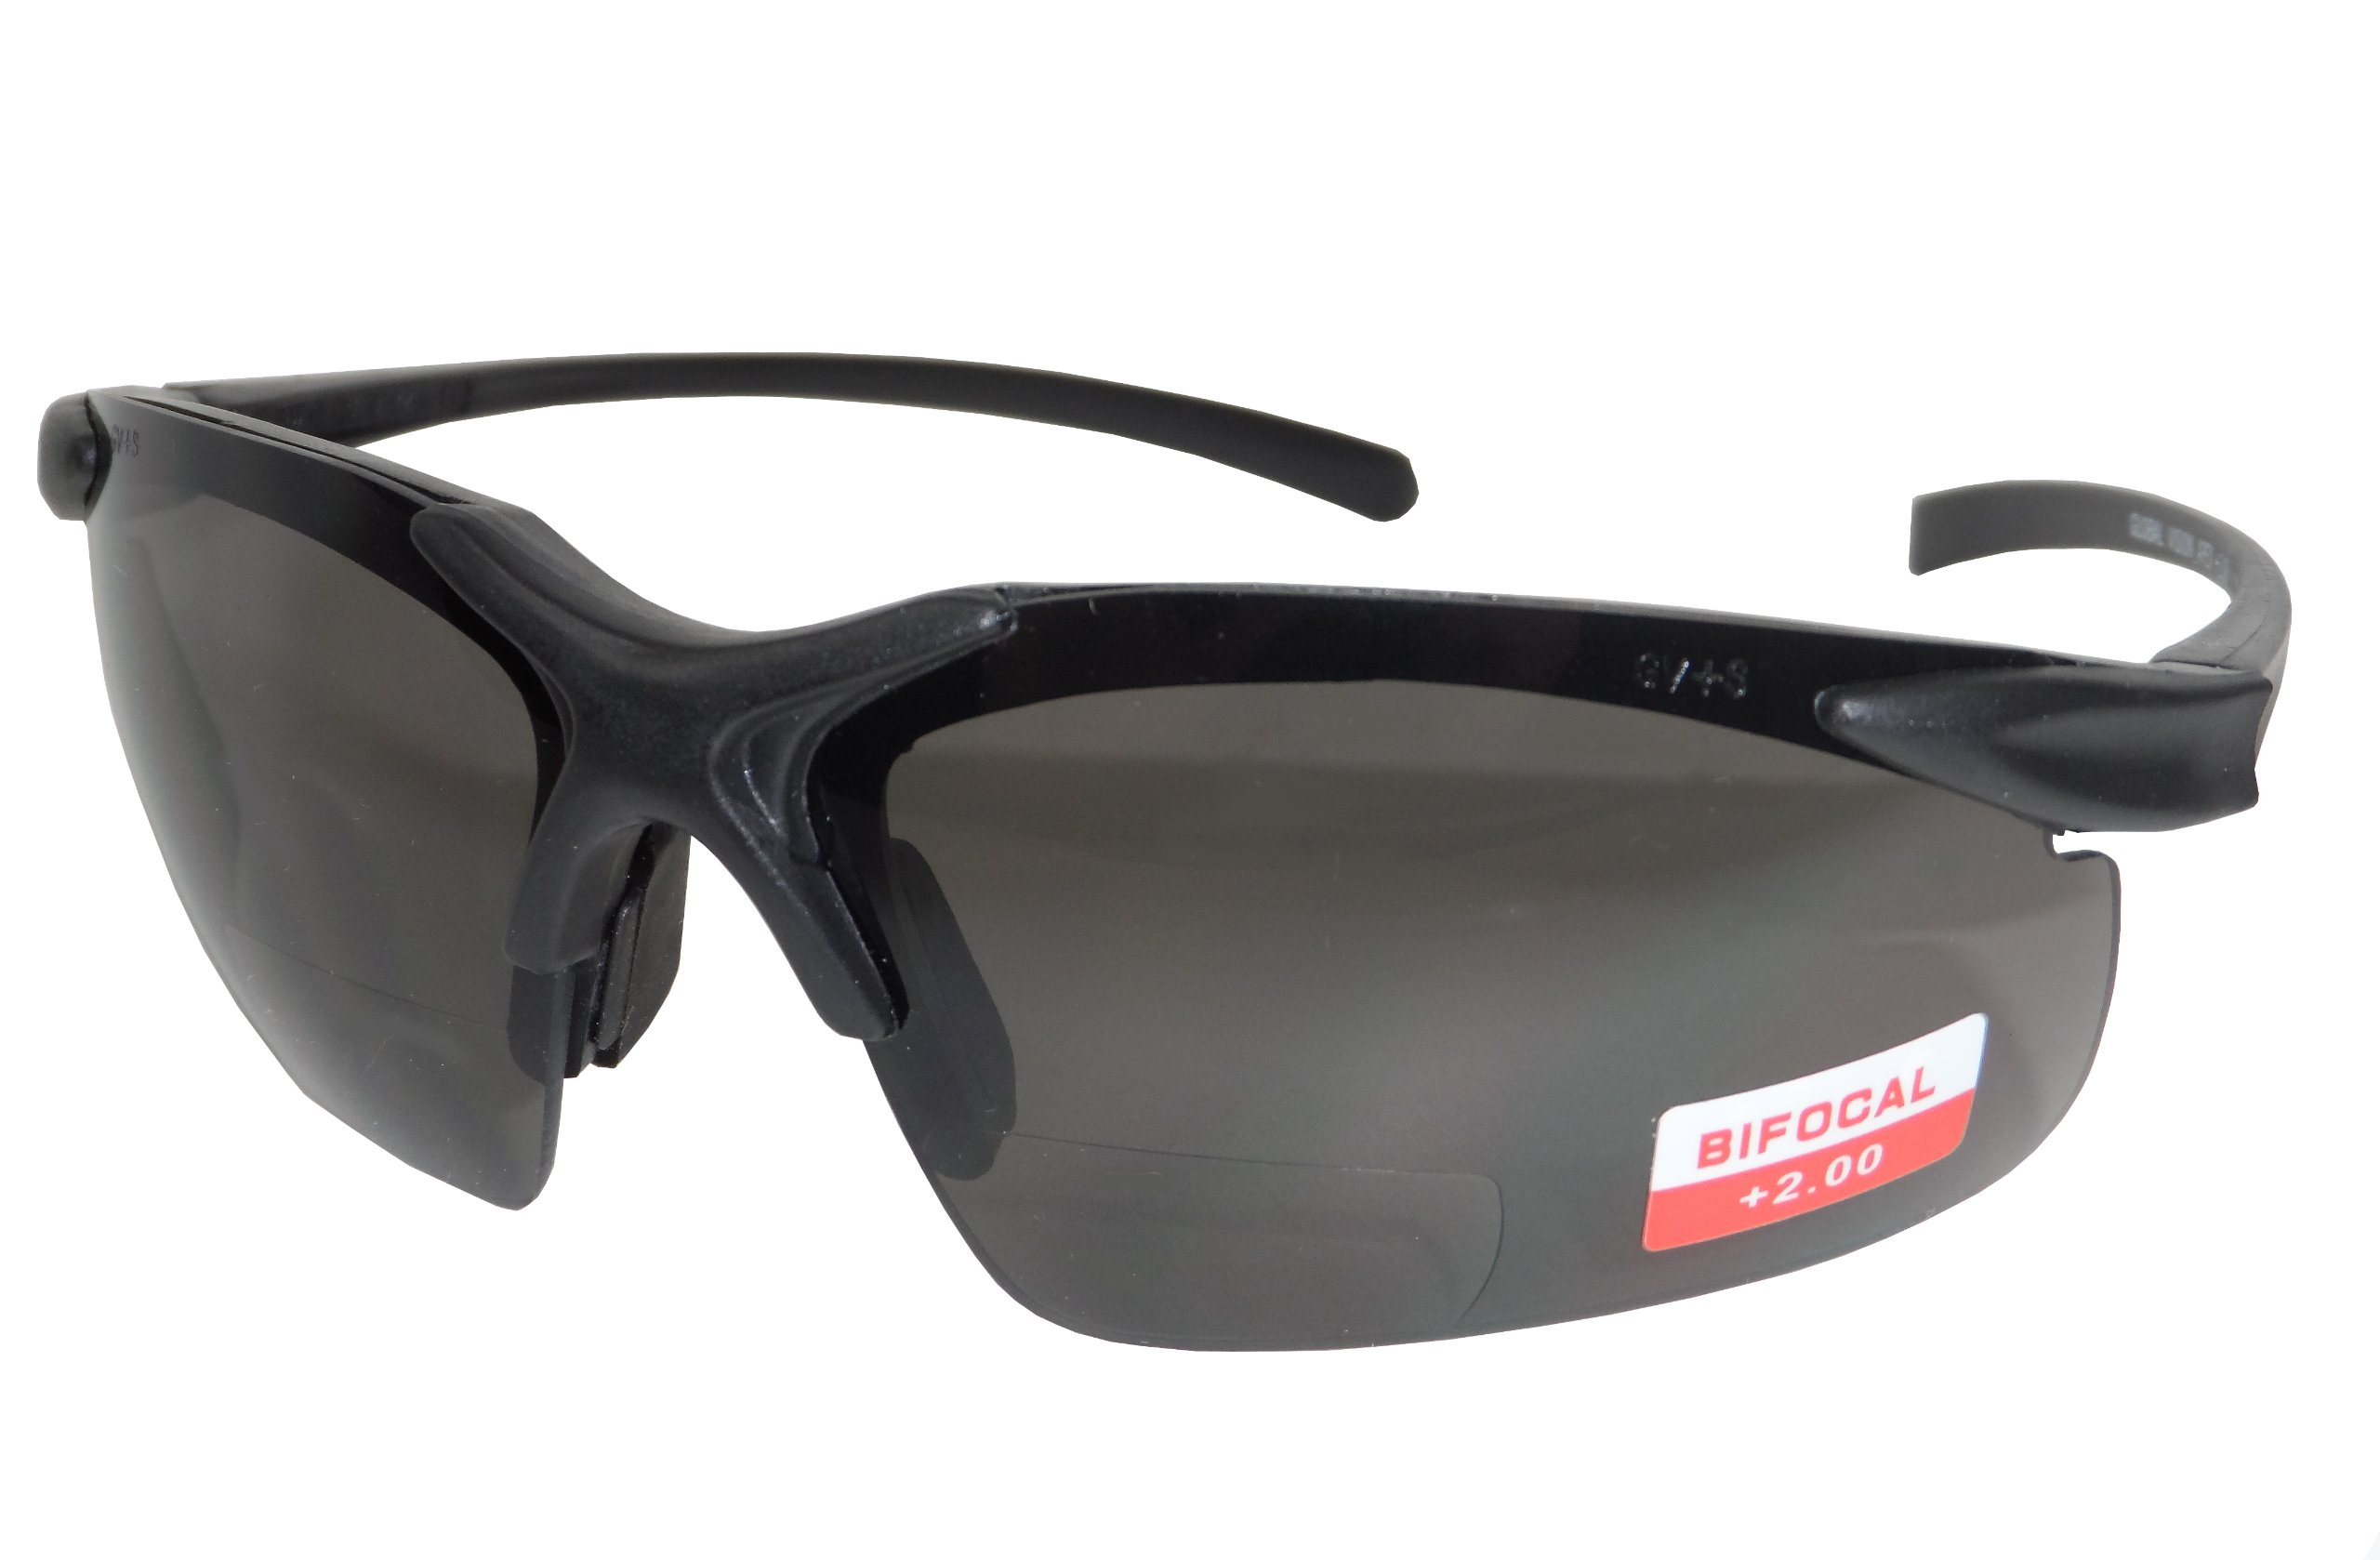 Apex Bifocal Smoke Safety Glasses (2.0 Magnification)